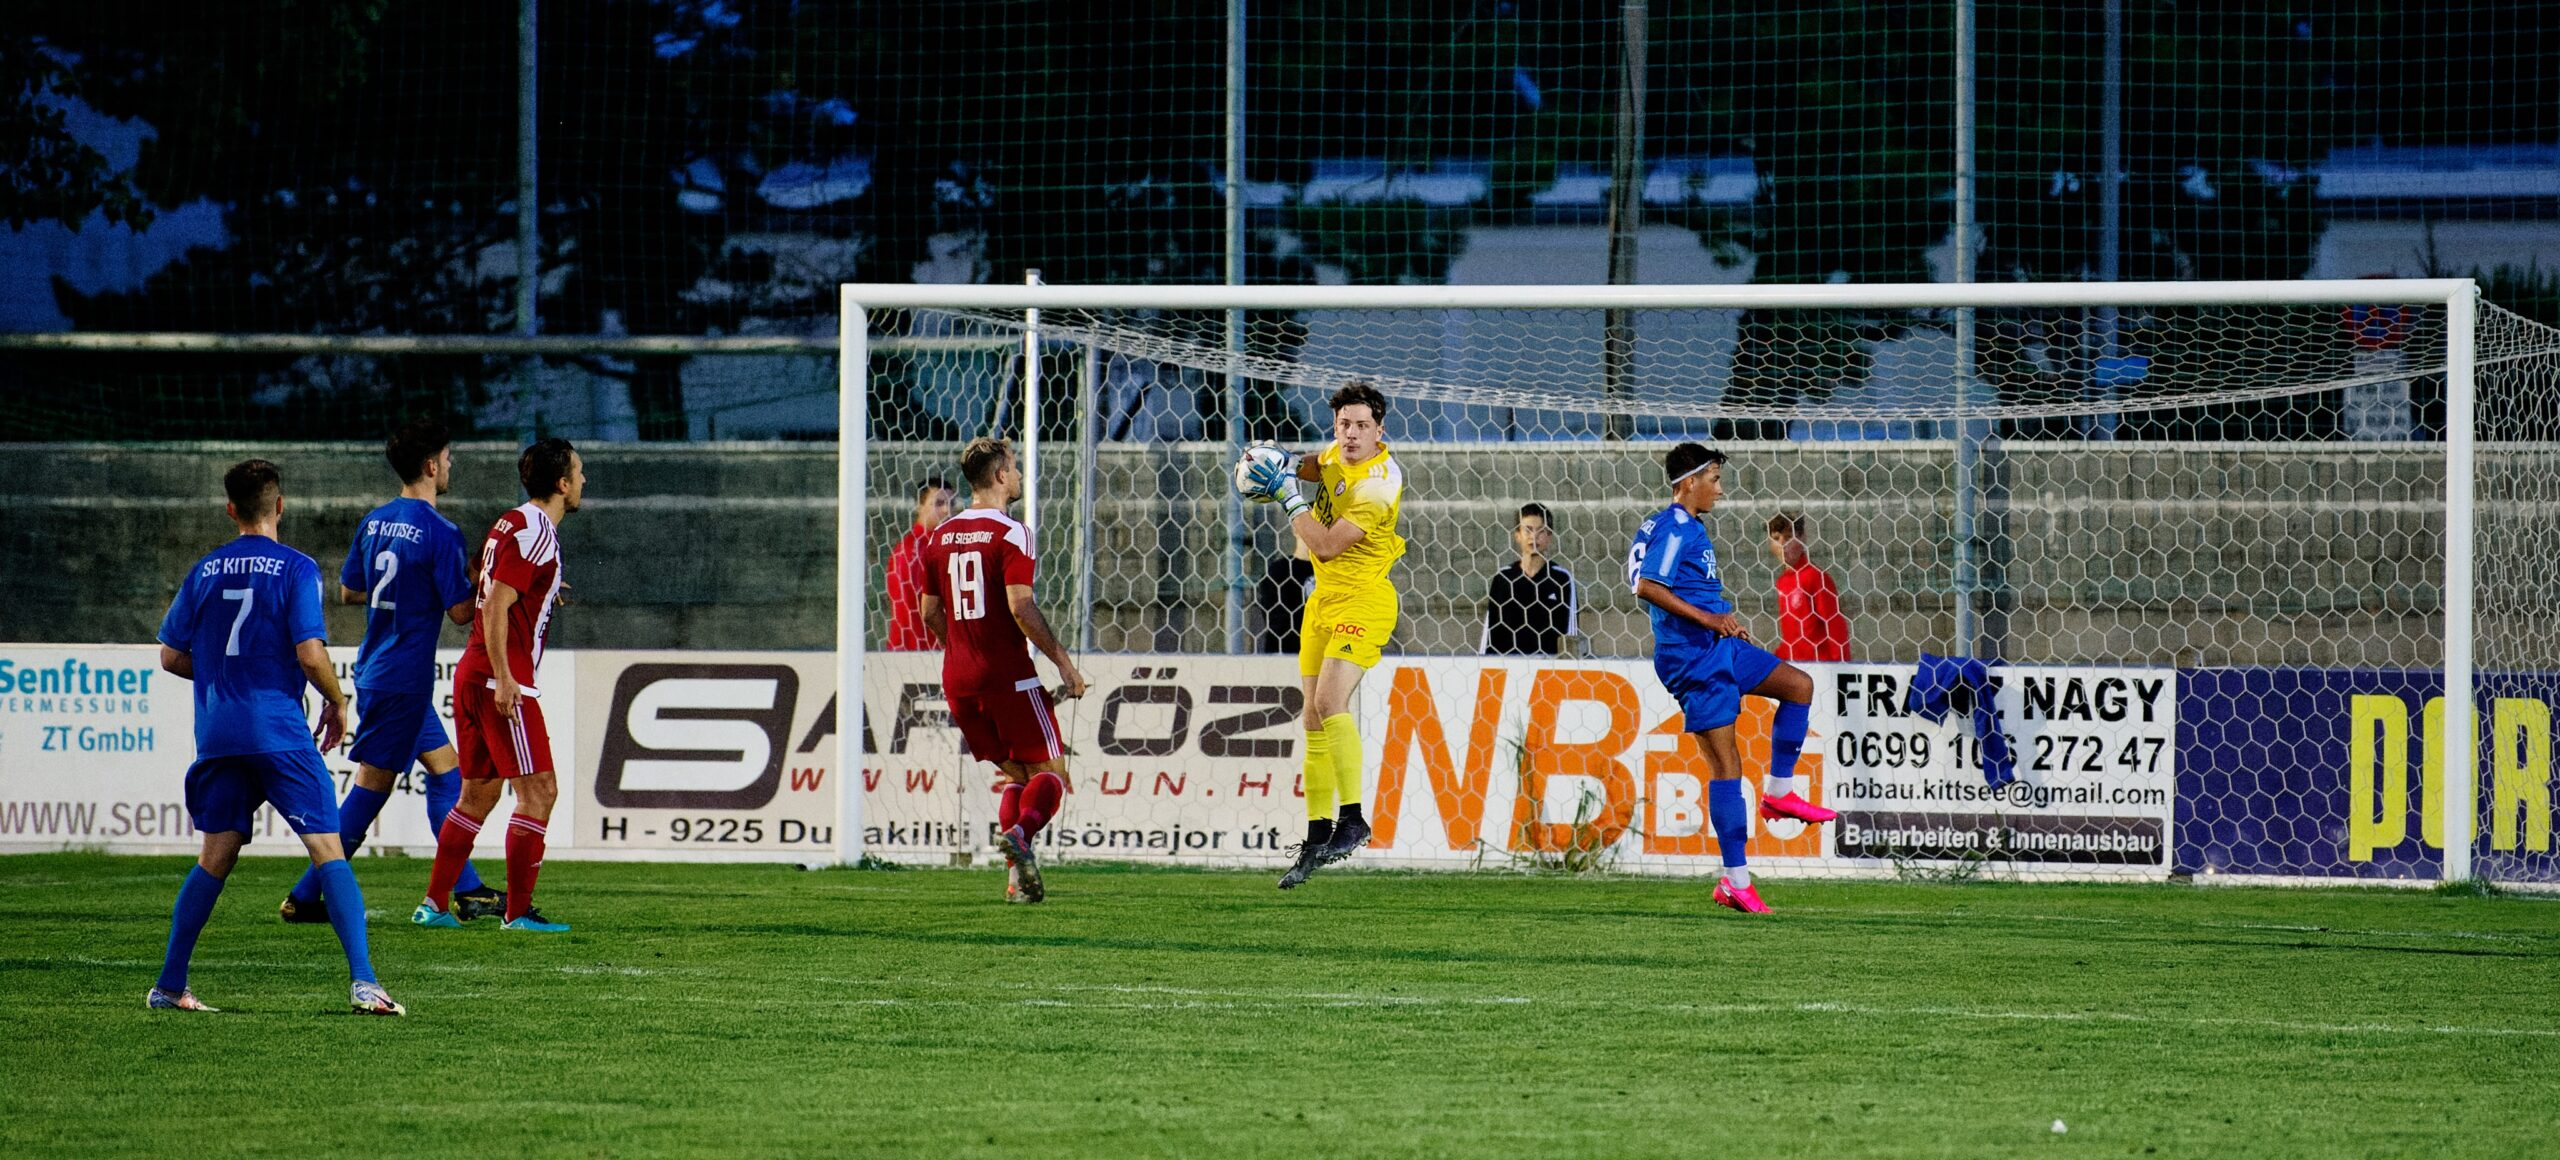 Siegendorf keeper Robert Gregull nimbly catches ball